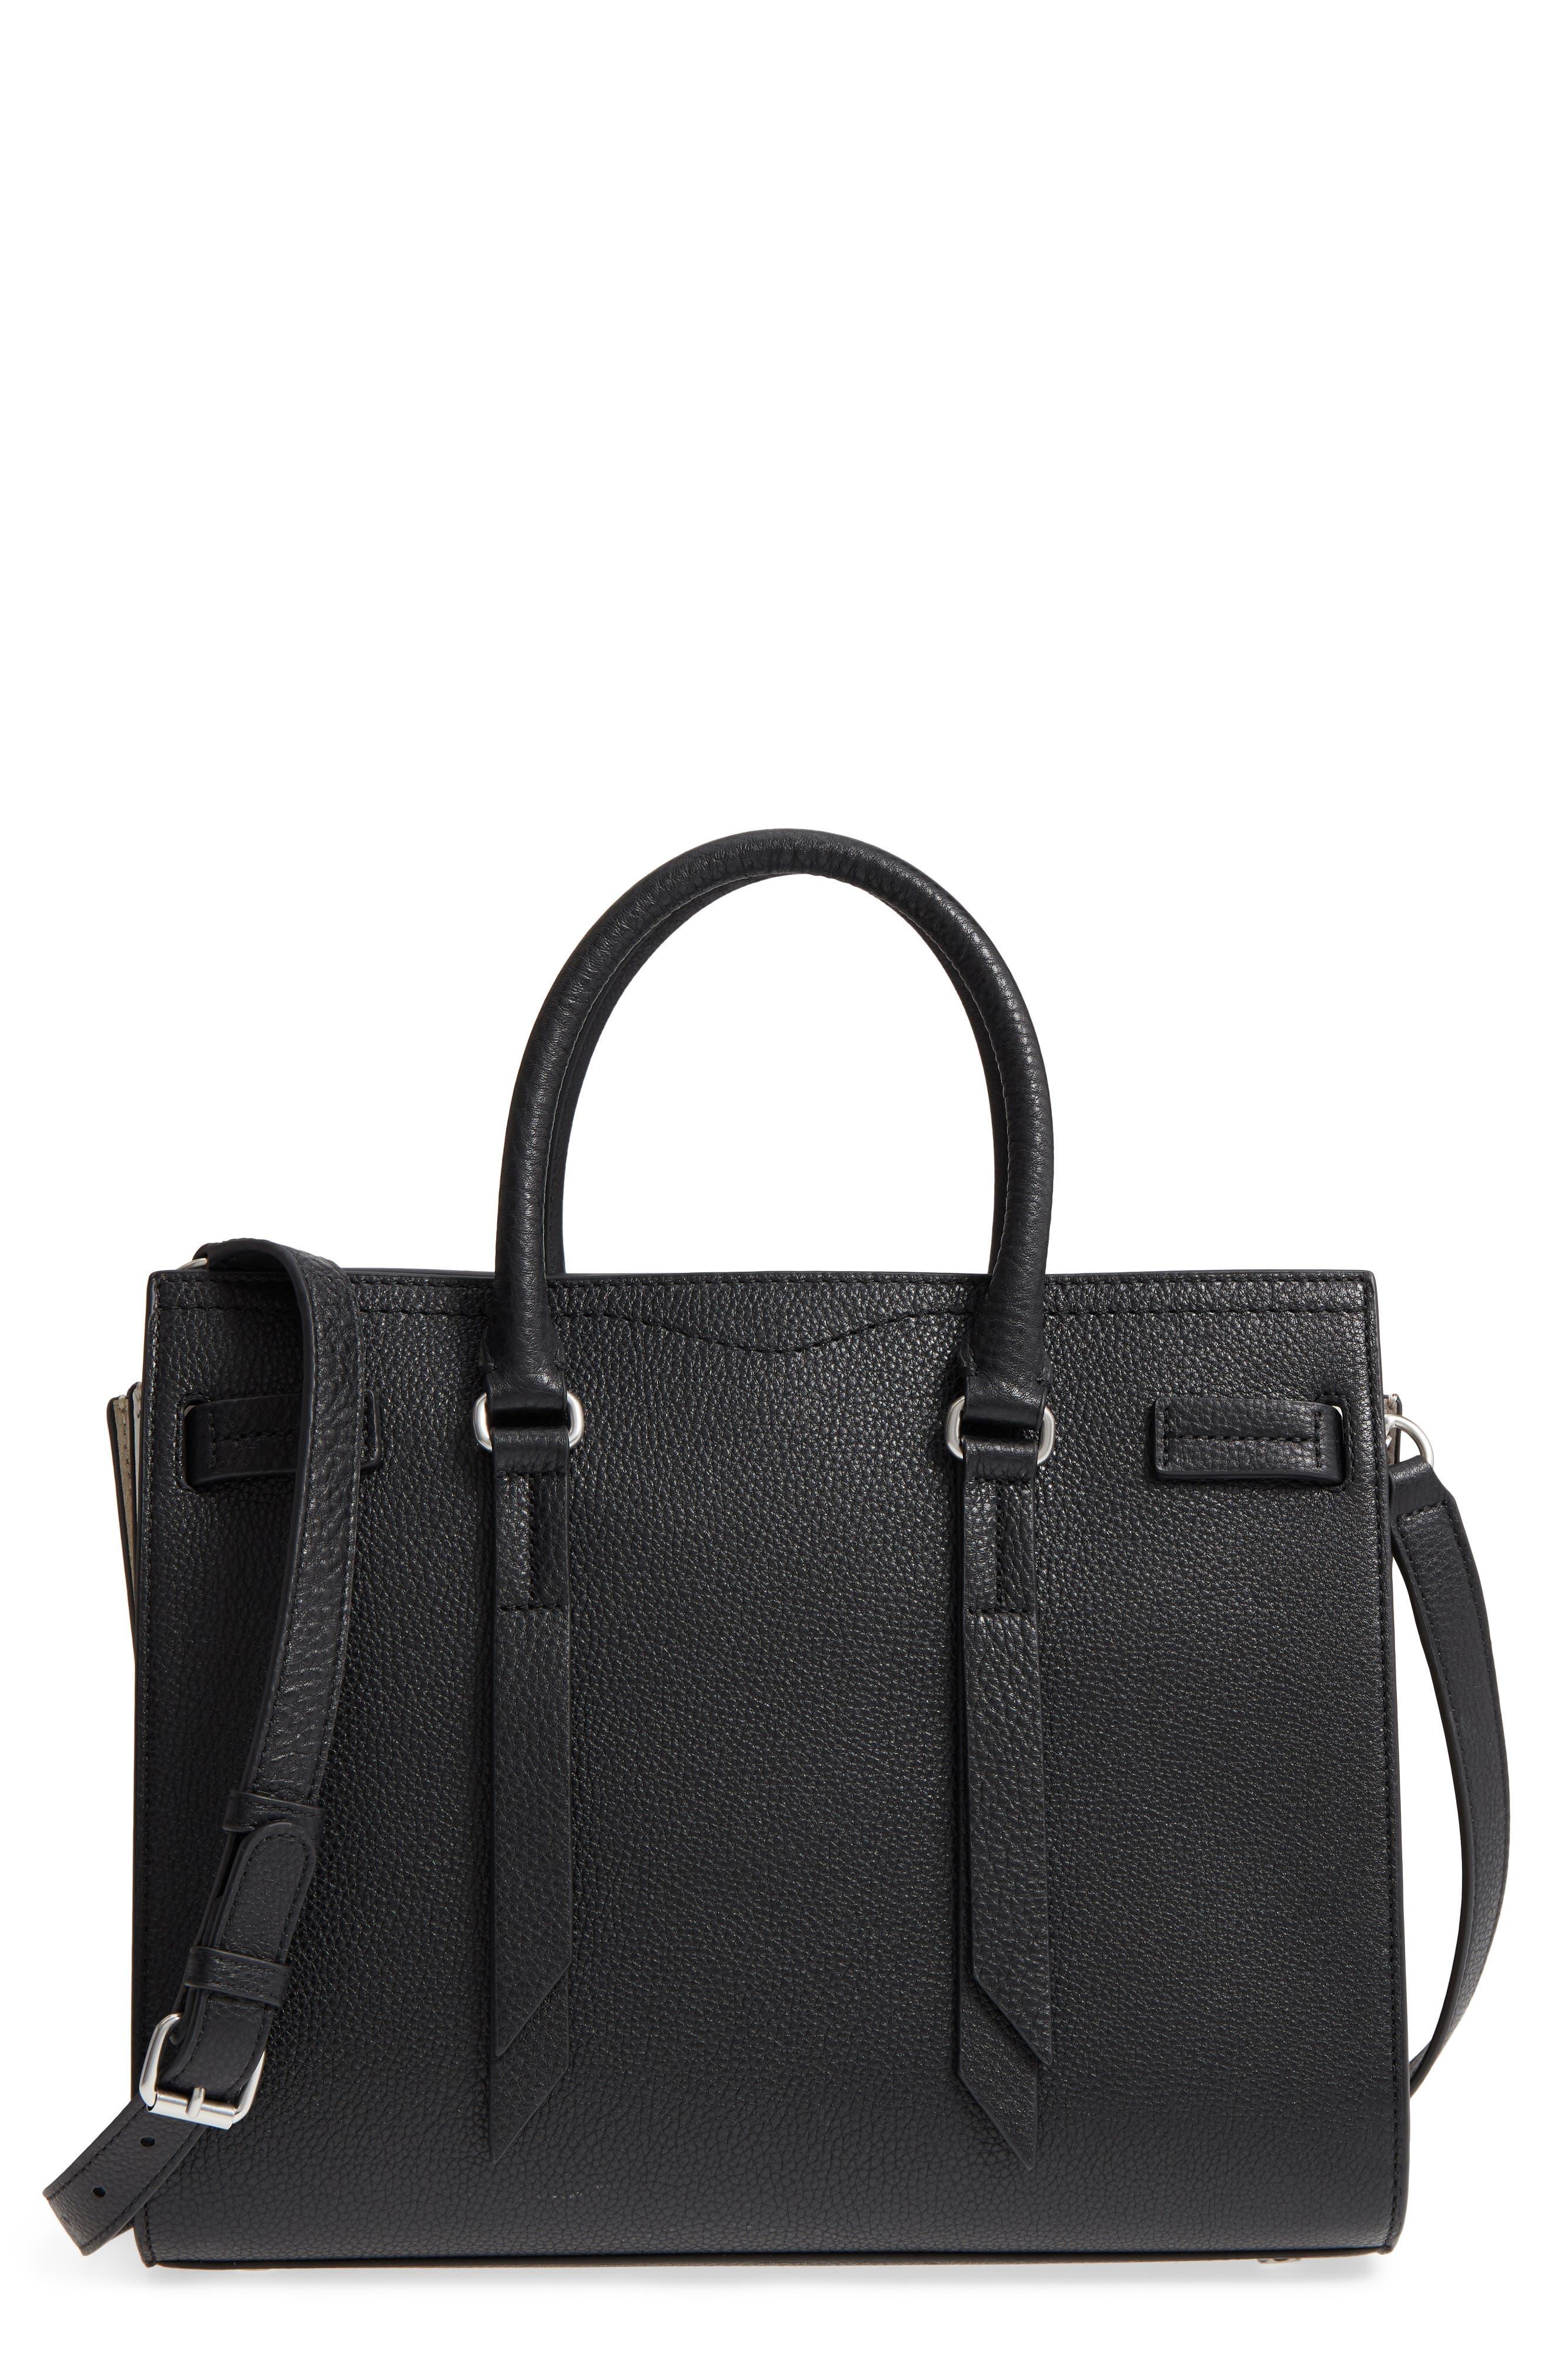 Sherry Calfskin Leather Satchel,                             Main thumbnail 1, color,                             002